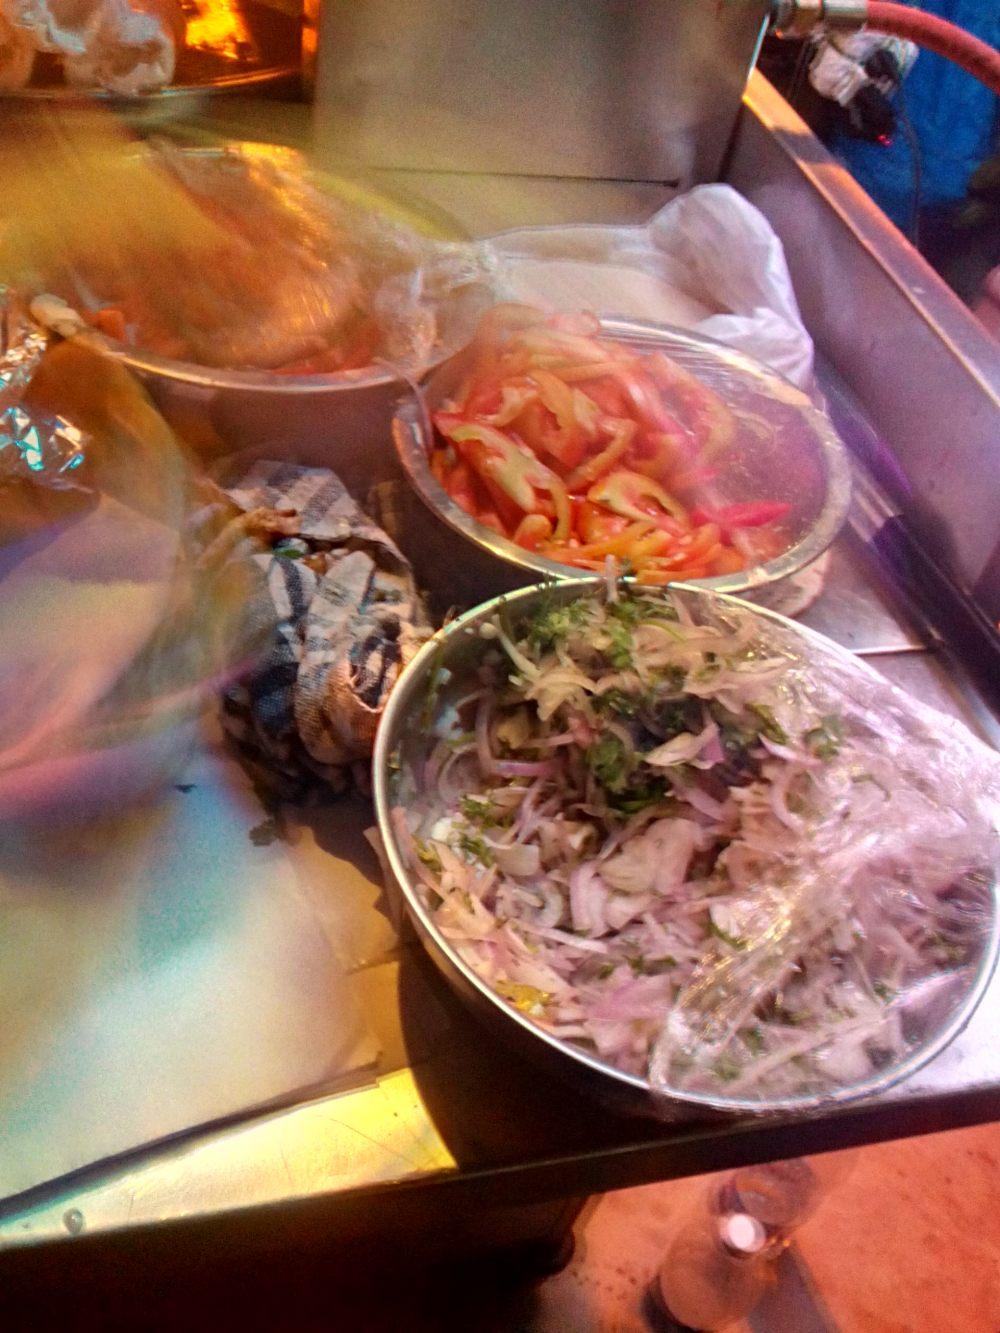 Relishing Barbecue 'Shawarma Style': Review-Shawarma Hut, Shawarma